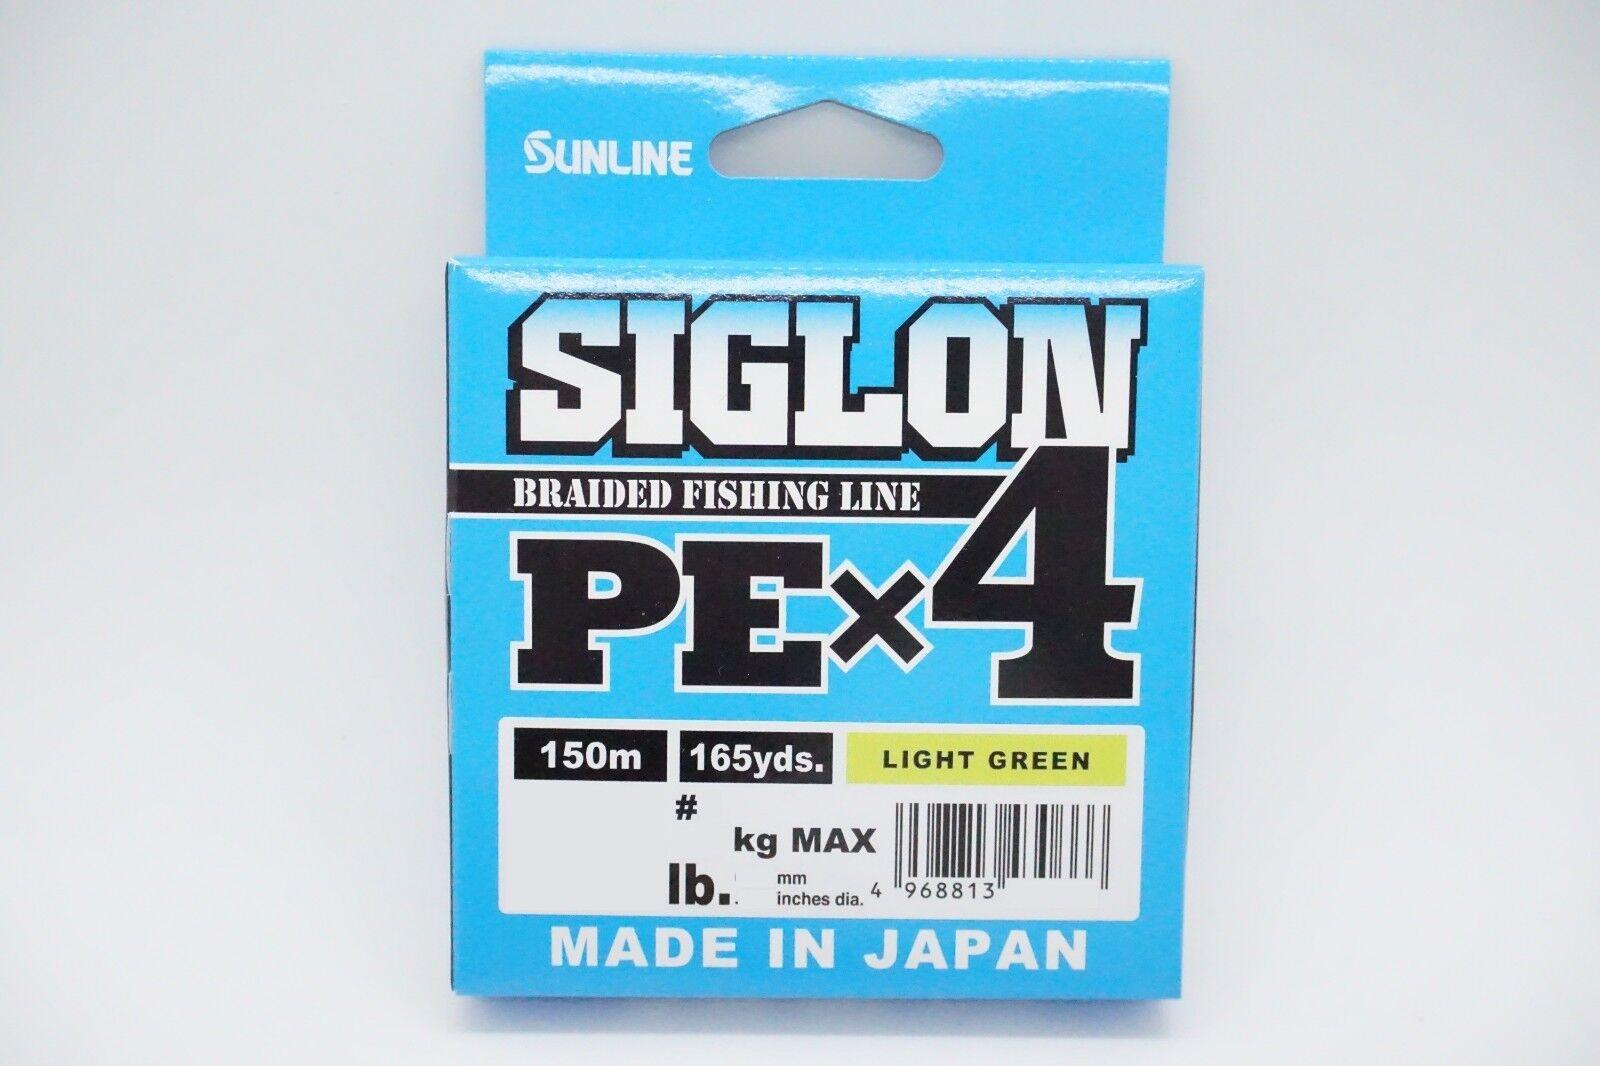 SUNLINE SaltiMate PE JIGGER ULT PE X4 Braided Line 200m Select LB